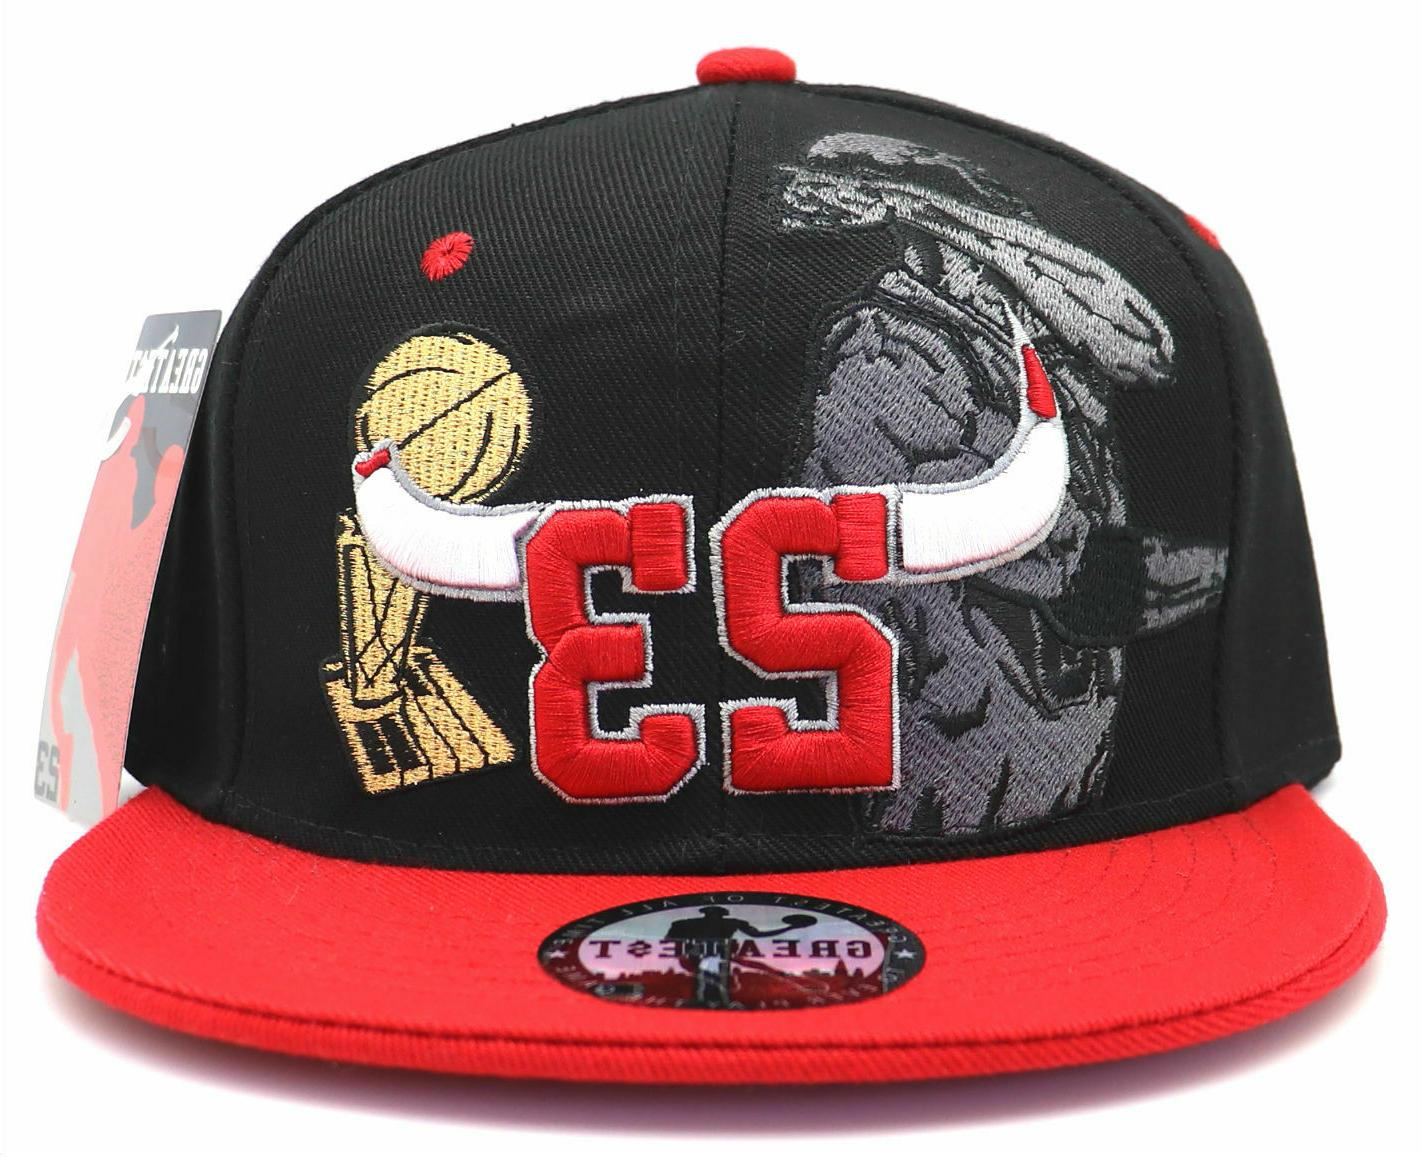 Chicago Greatest 23 Bulls Red Trophy Hat Cap